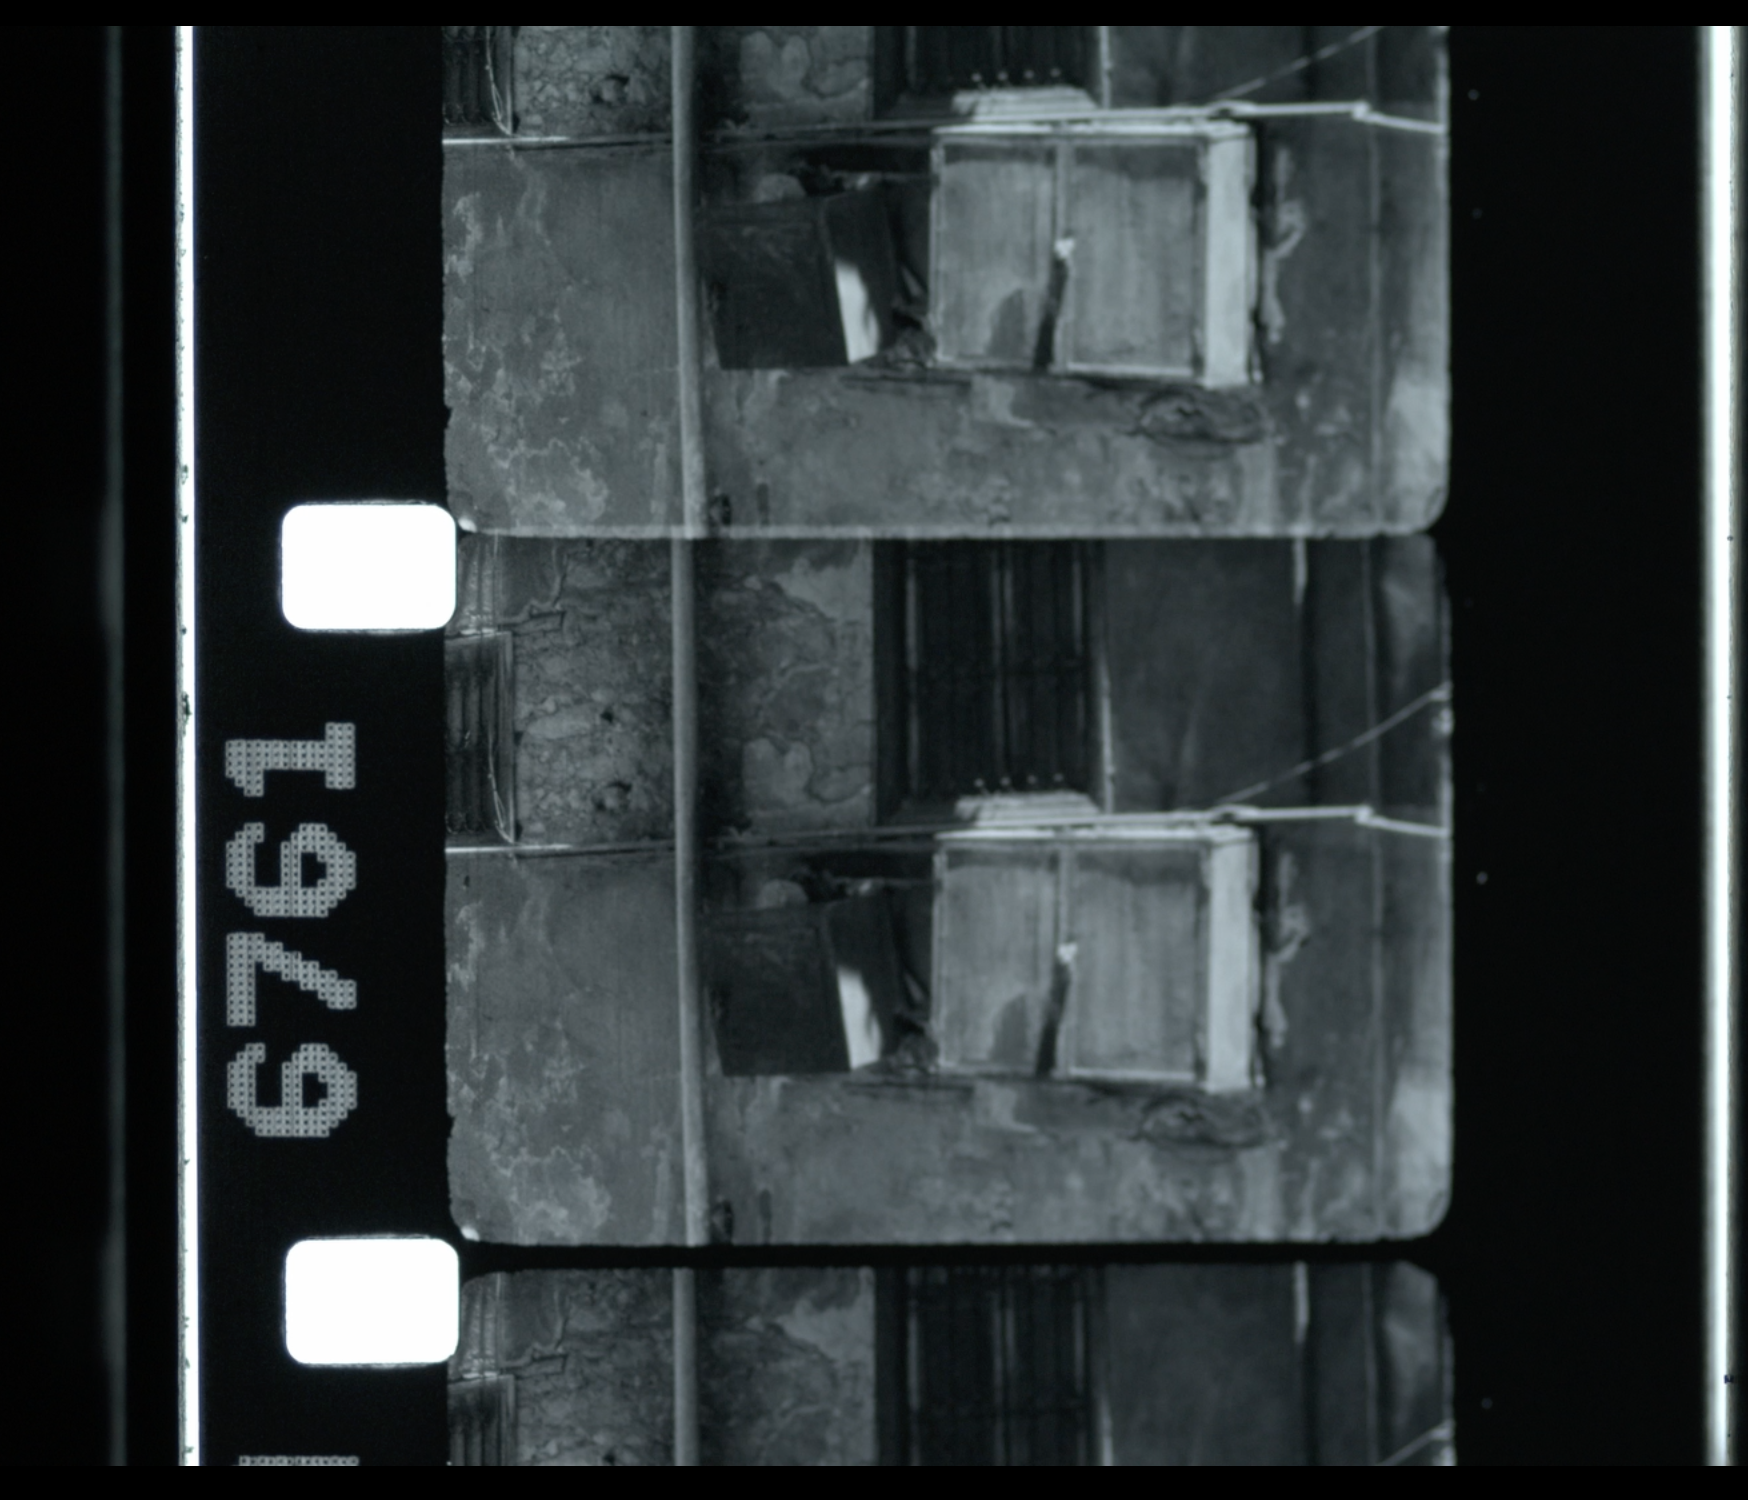 Courtesy of the Cimatheque – Alternative Film Center in Cairo